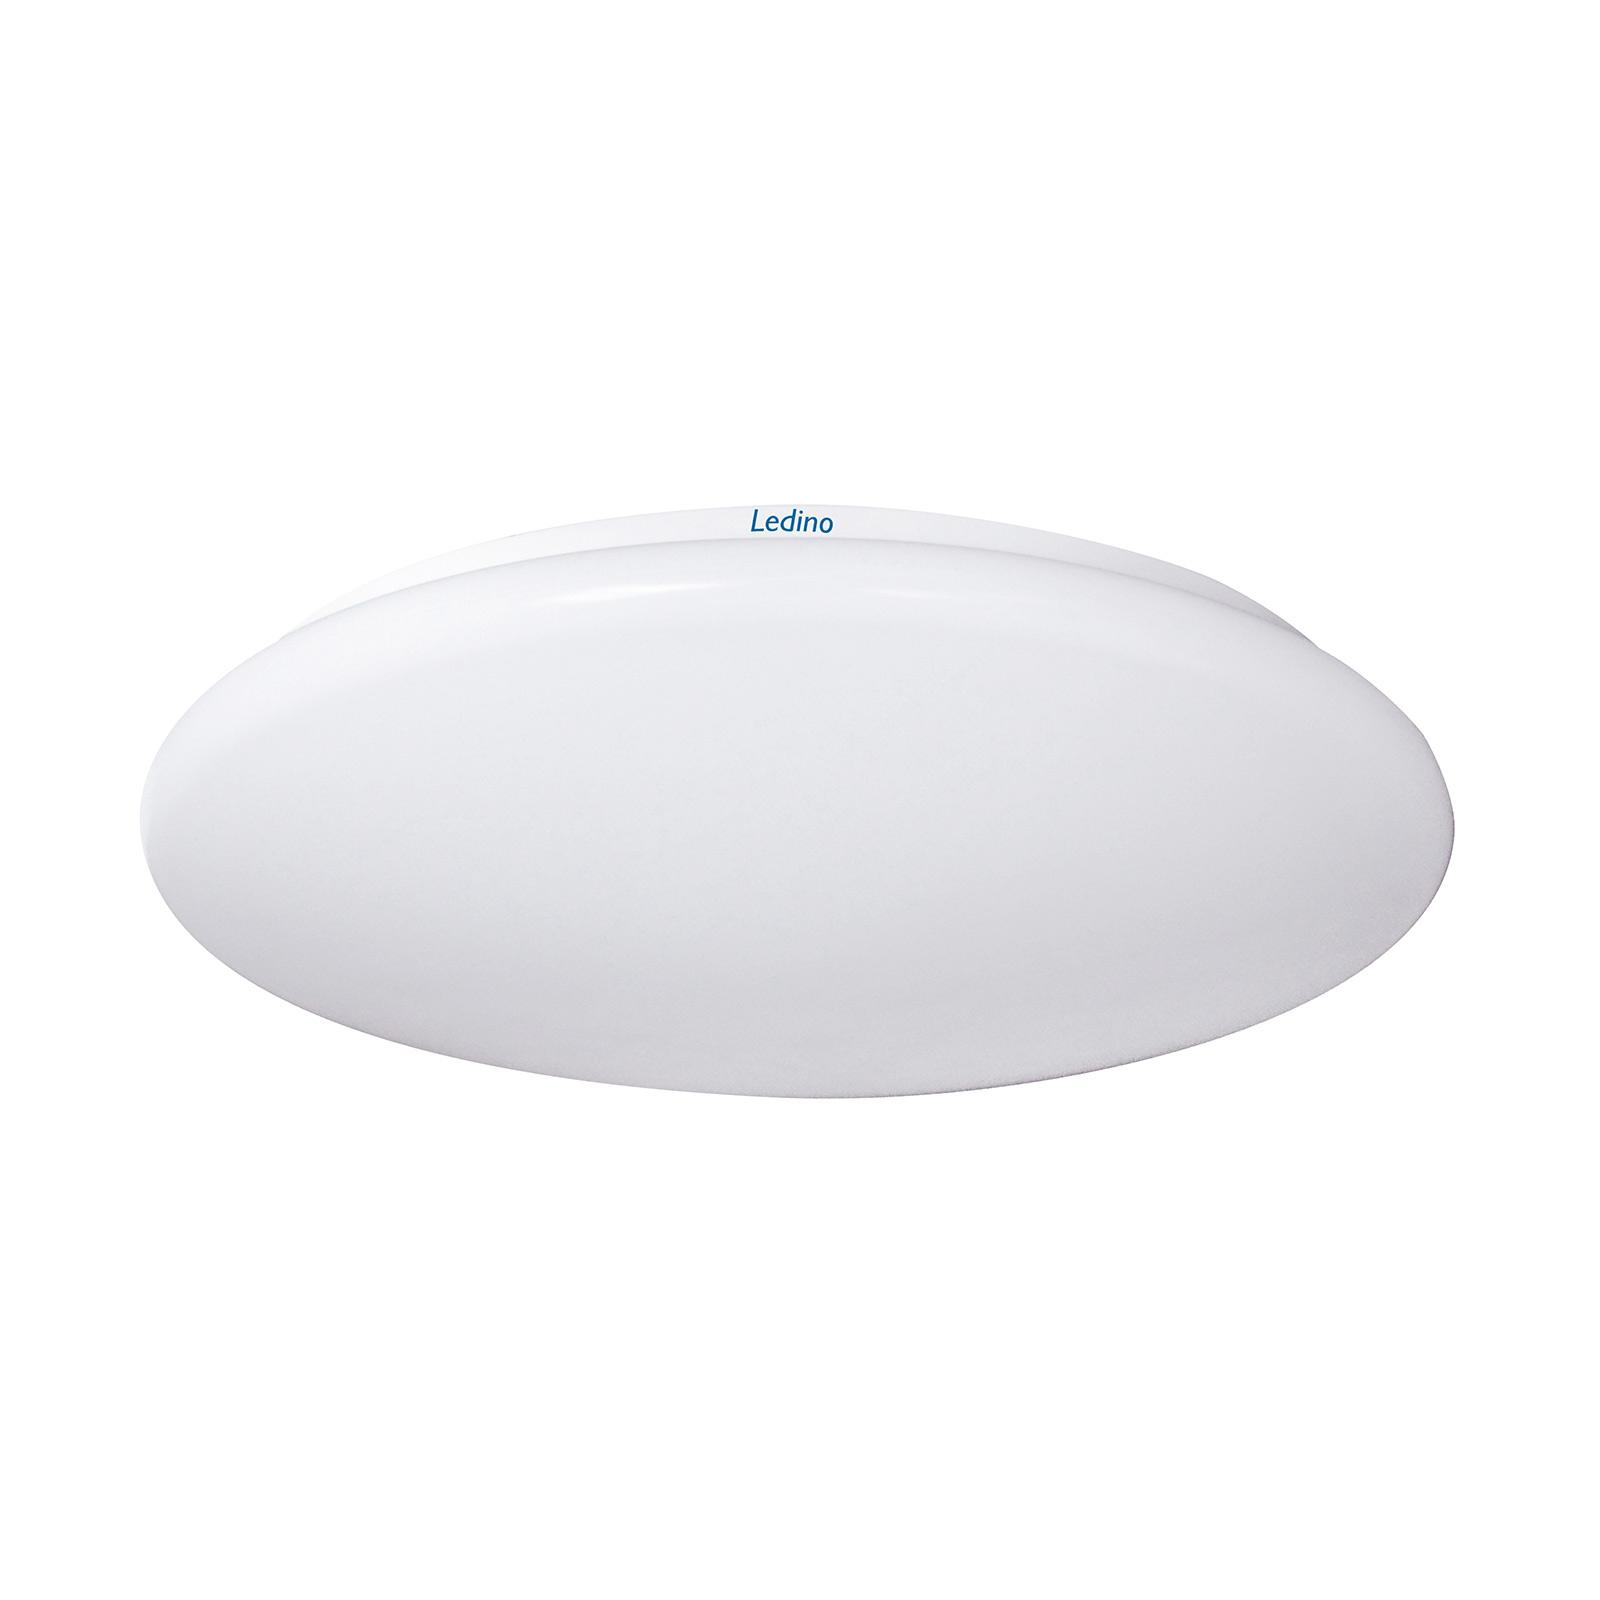 LED-Deckenlampe Altona MN3, universalweiß Ø 32,8cm